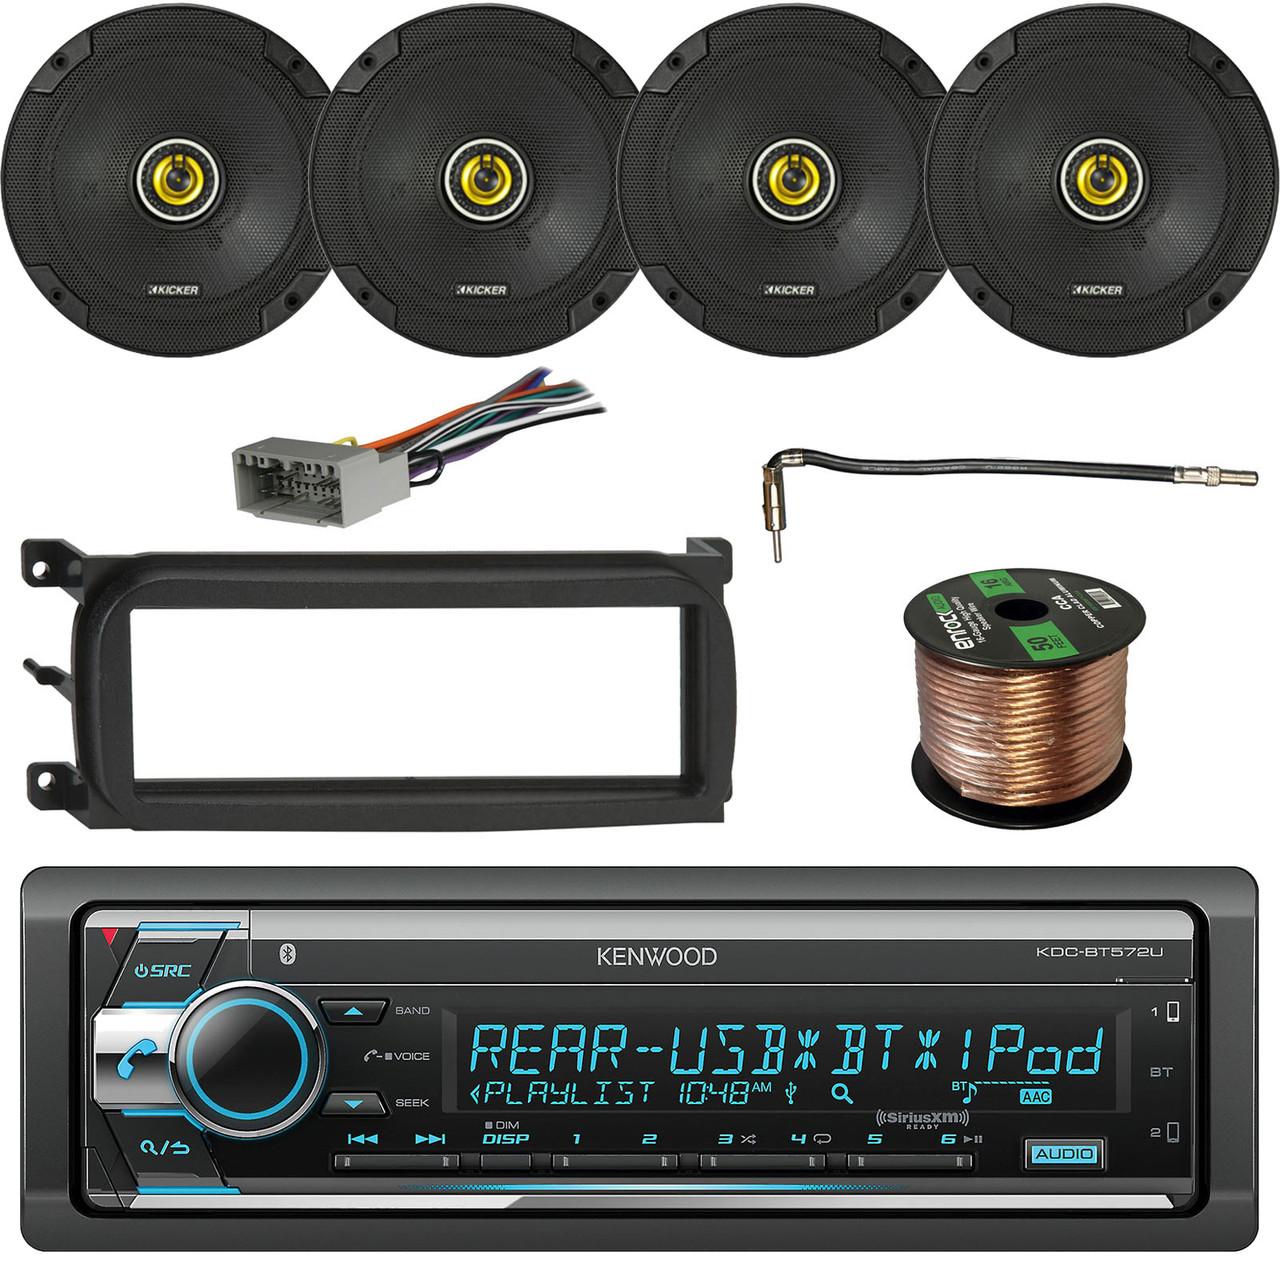 medium resolution of  kenwood stereo receiver bluetooth w kicker 600w speakers 2 pairs on kenwood